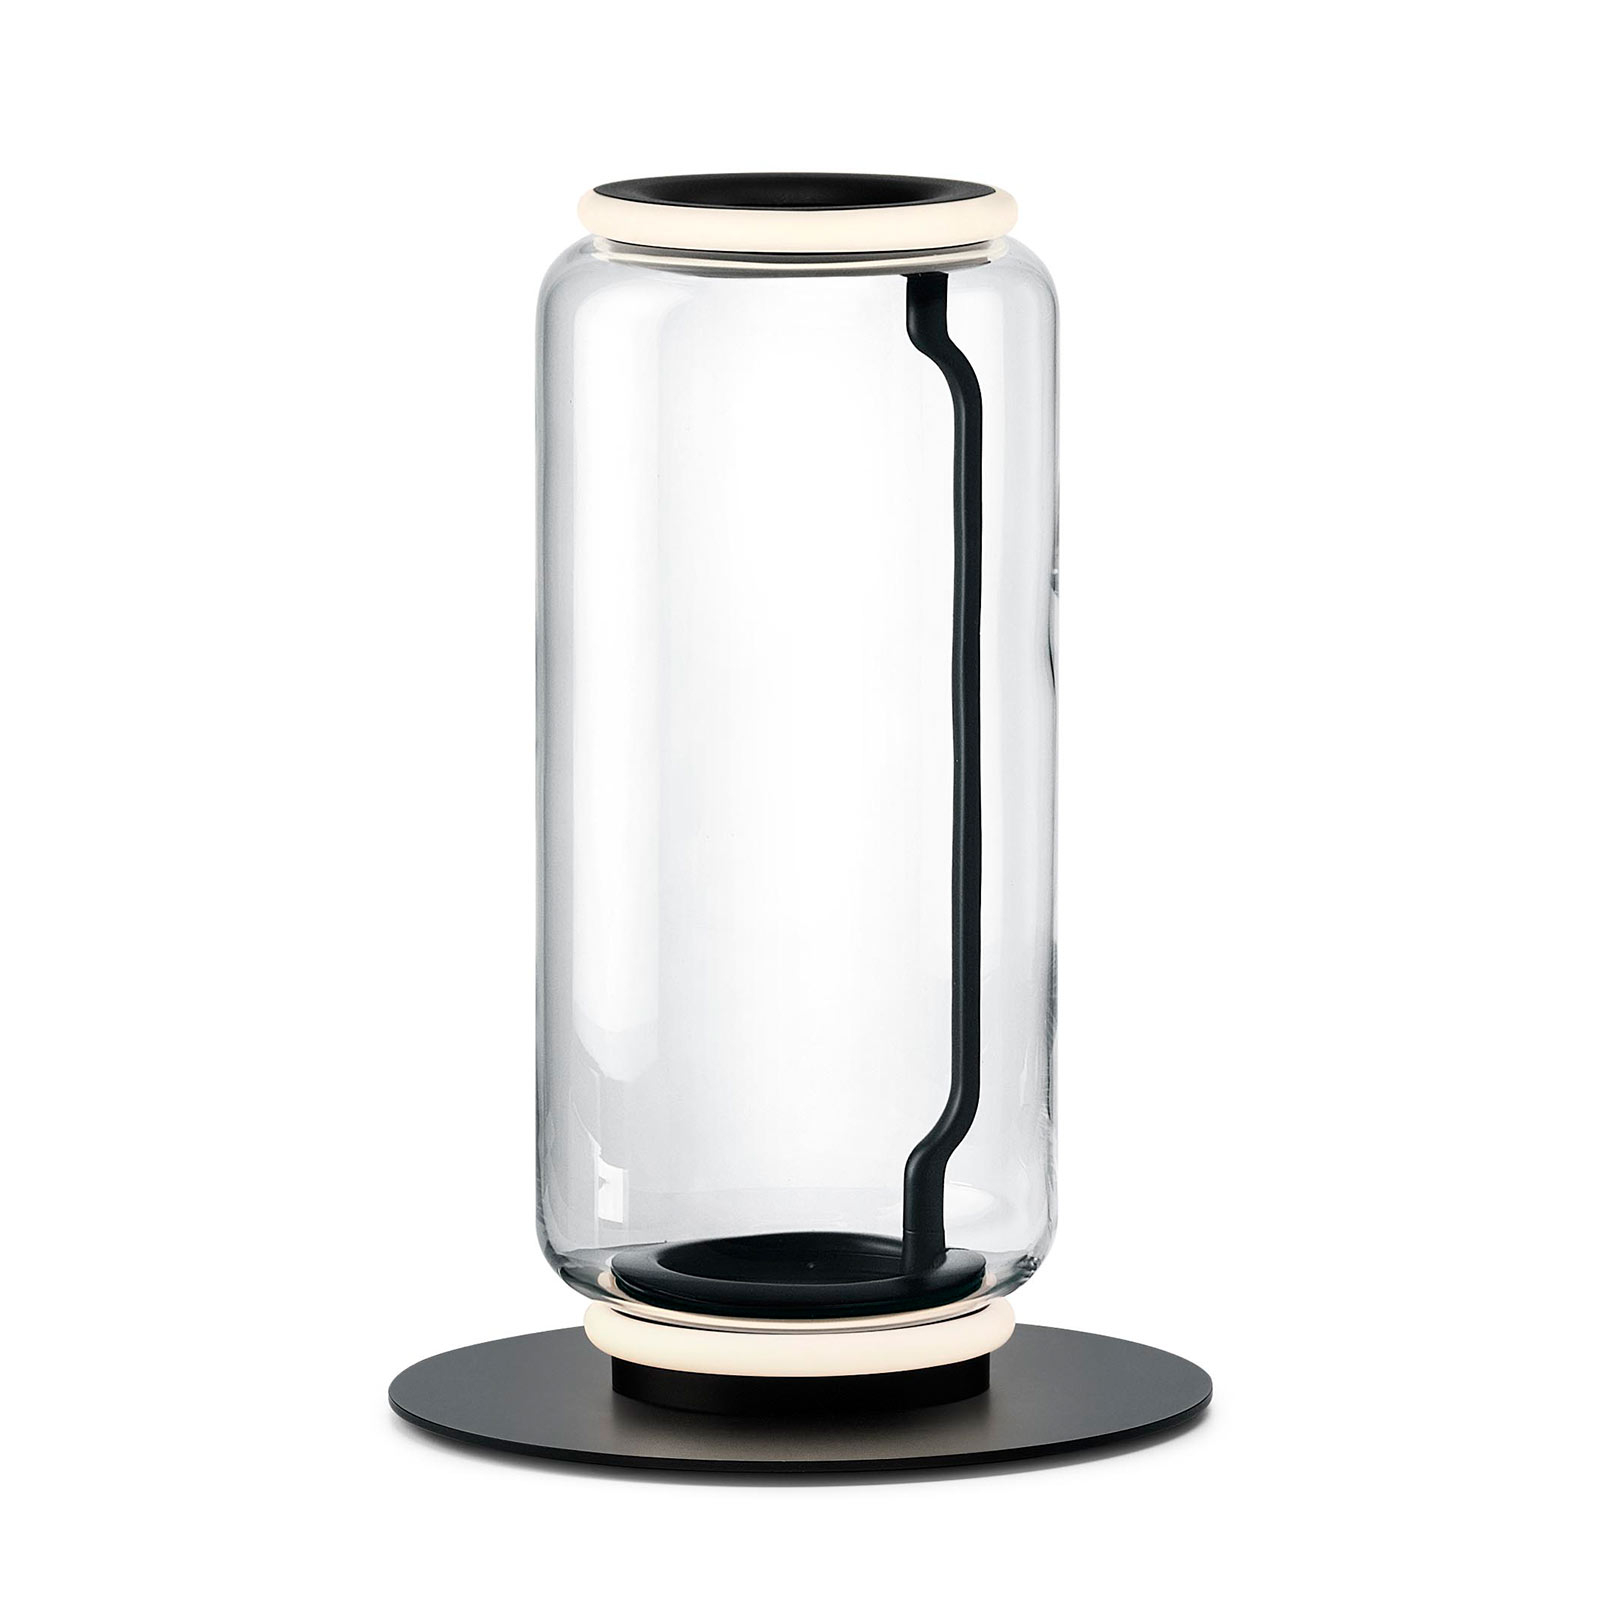 FLOS Noctambule 1 High Cylinder, small base